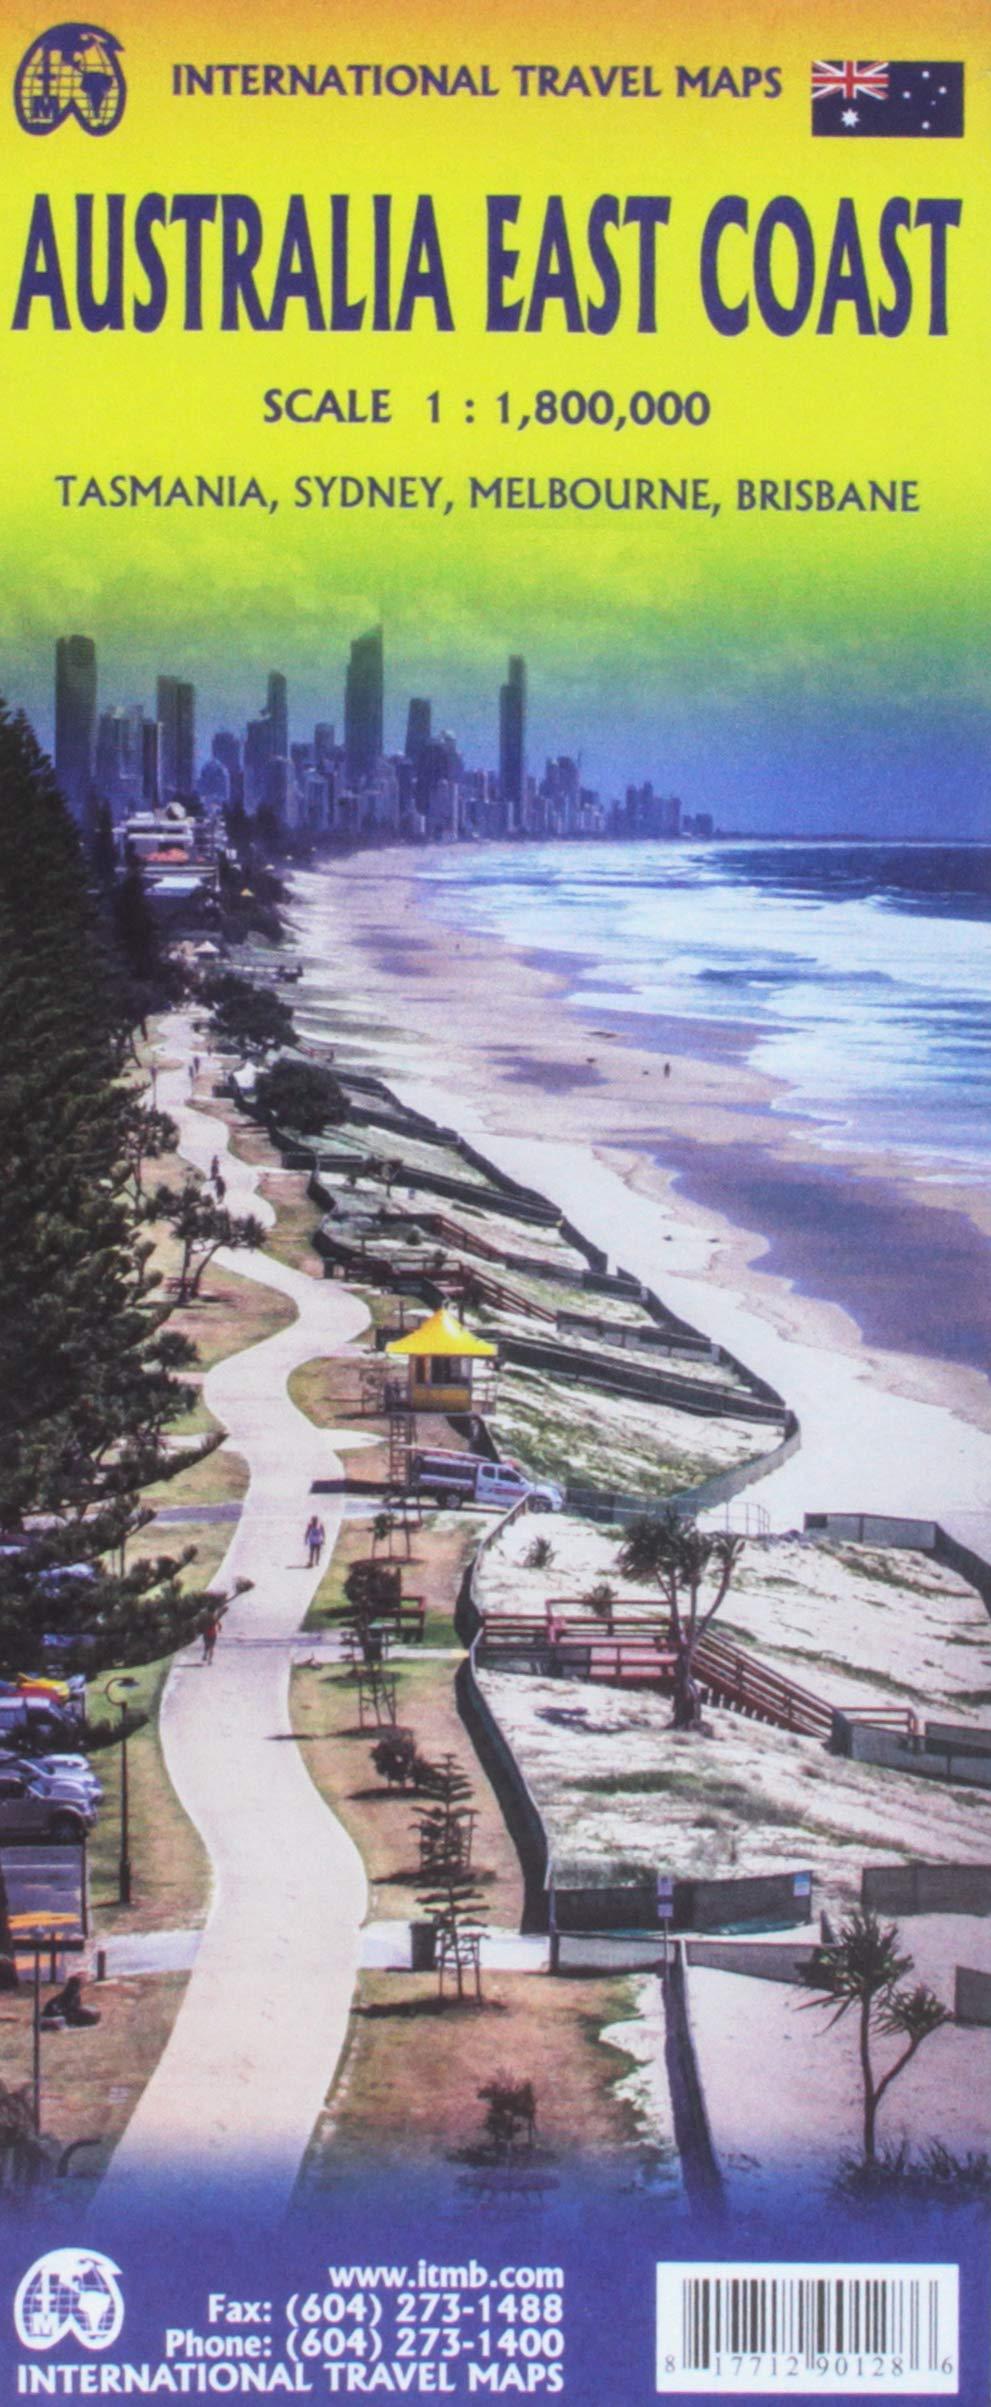 Map Of East Coast Of Australia.Australia East Coast Travel Reference Map Itmb Publishing